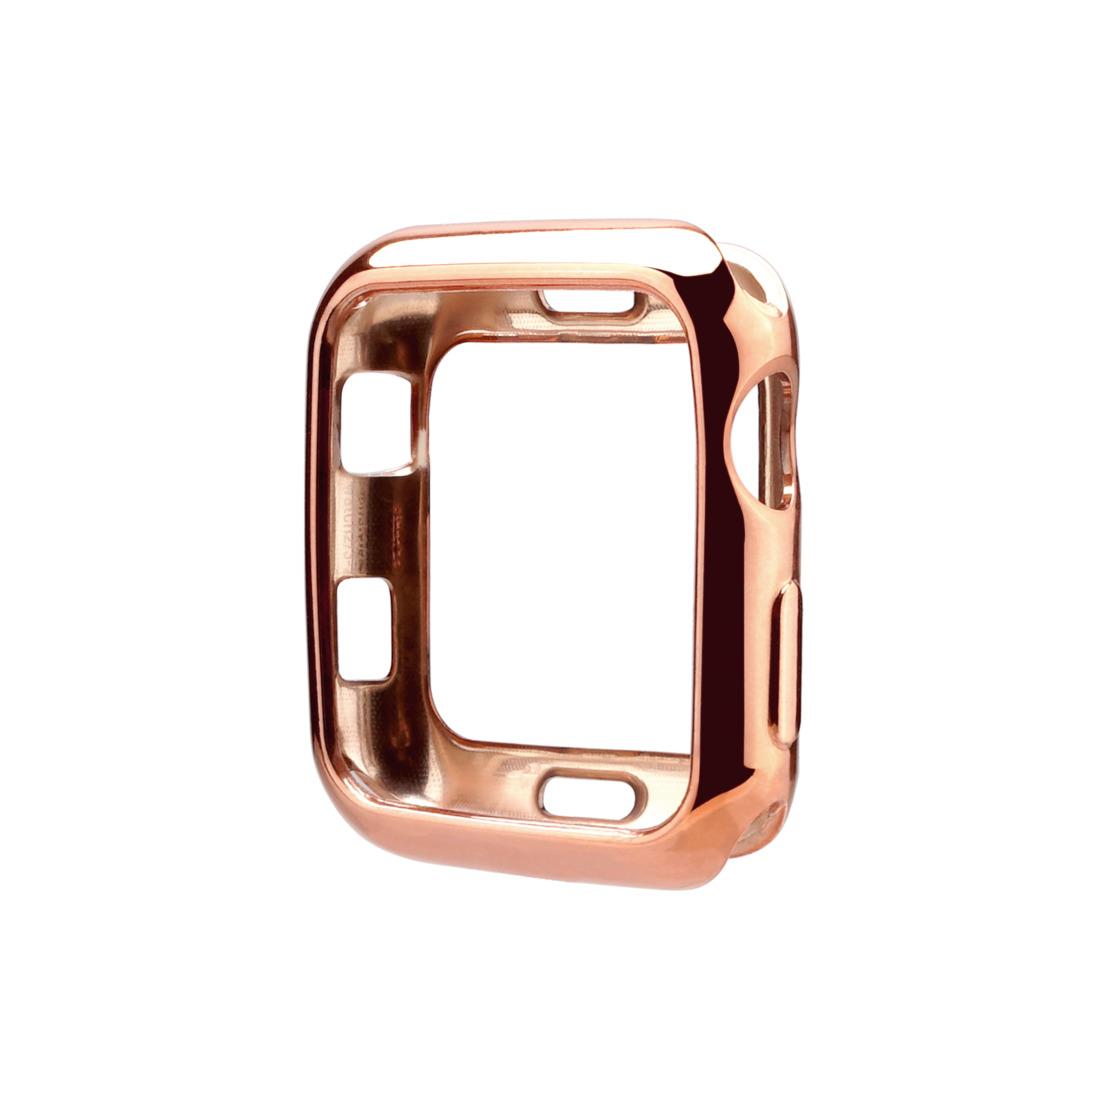 iPhone 7 Plus/7/6 Plus/6/5/5s/5c Case - Gold Apple Watch Case (38mm/40mm)